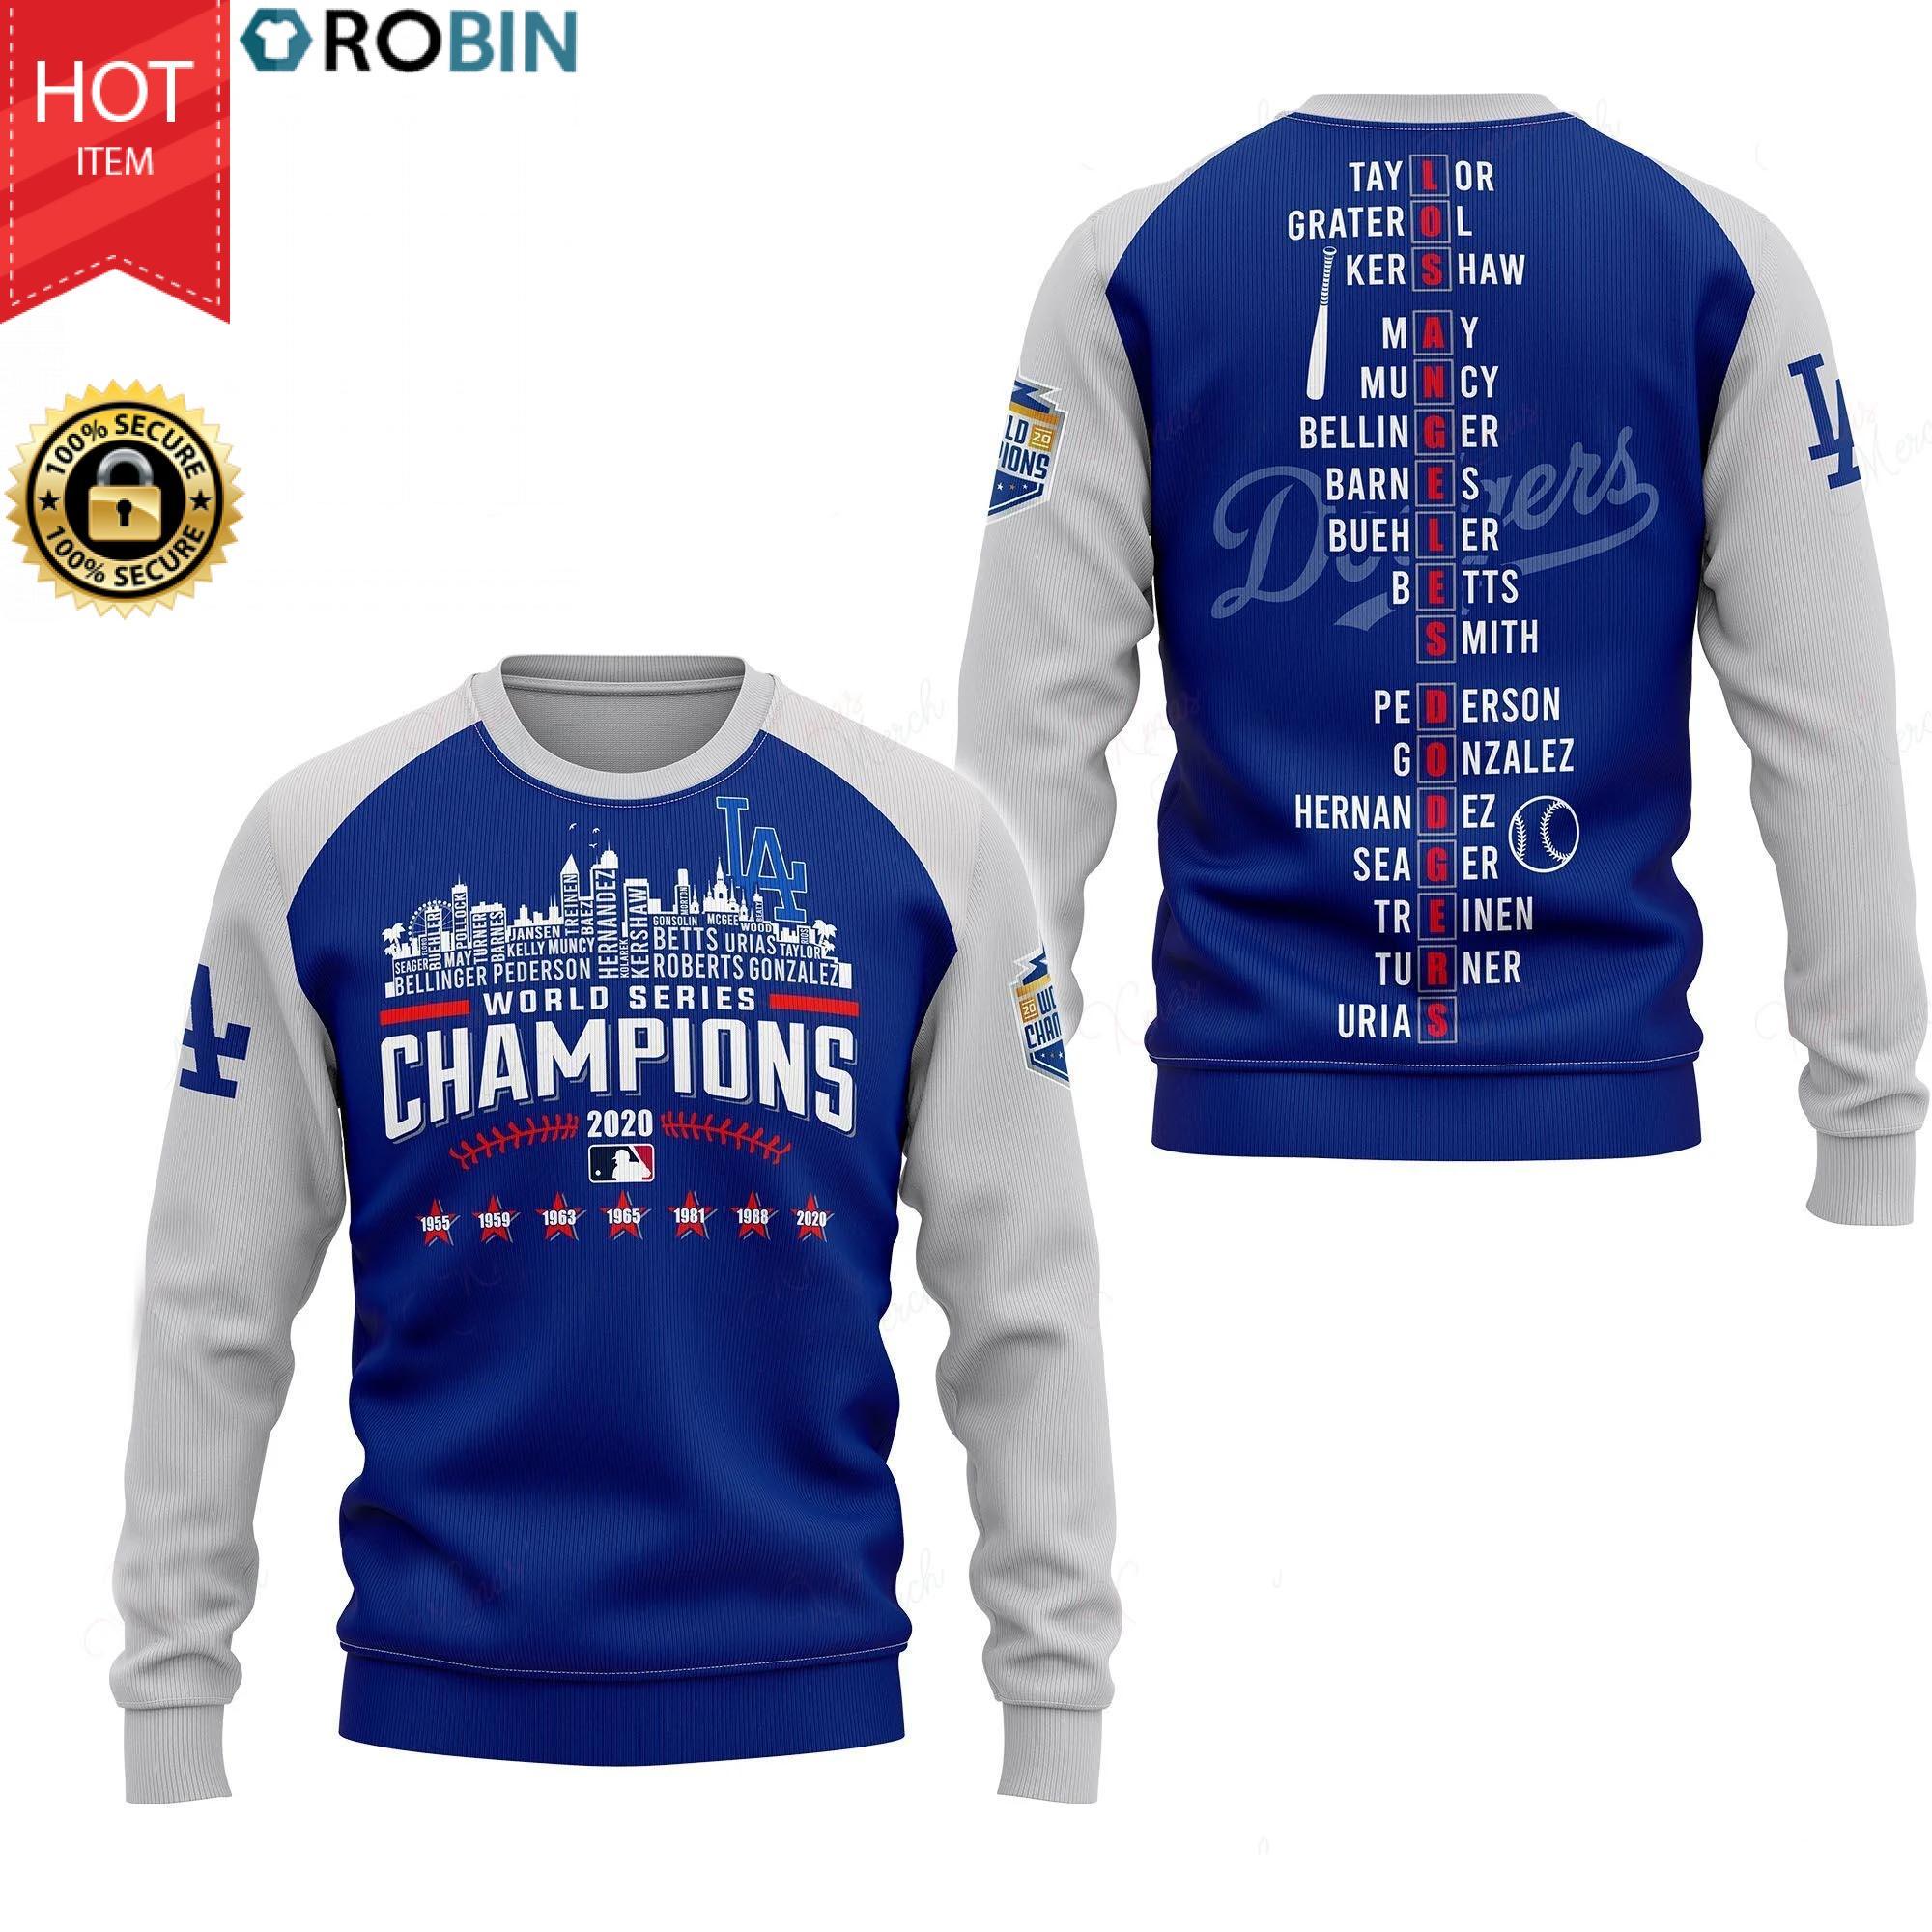 Los Angeles Dodgers 2020 World Series Champions Full Print Hoodie, T Shirt